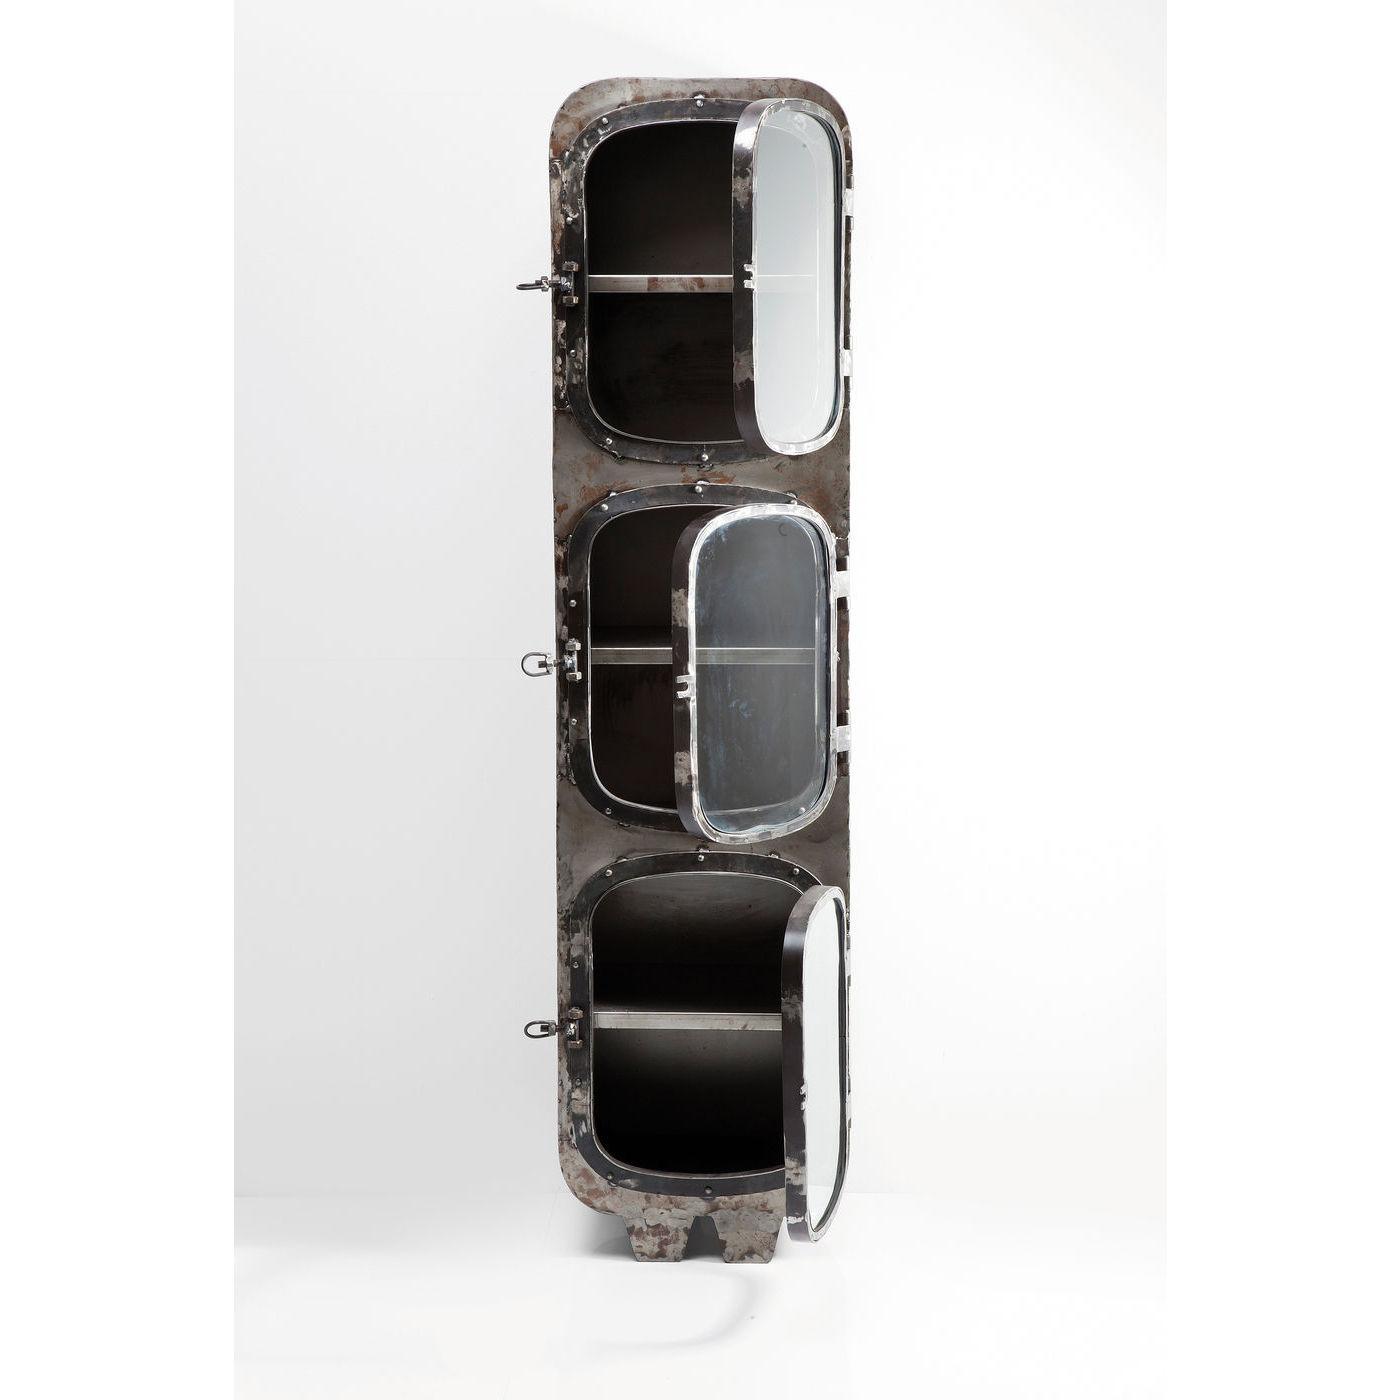 vitrine schrank anrichte aufbewahung buffet kommode. Black Bedroom Furniture Sets. Home Design Ideas